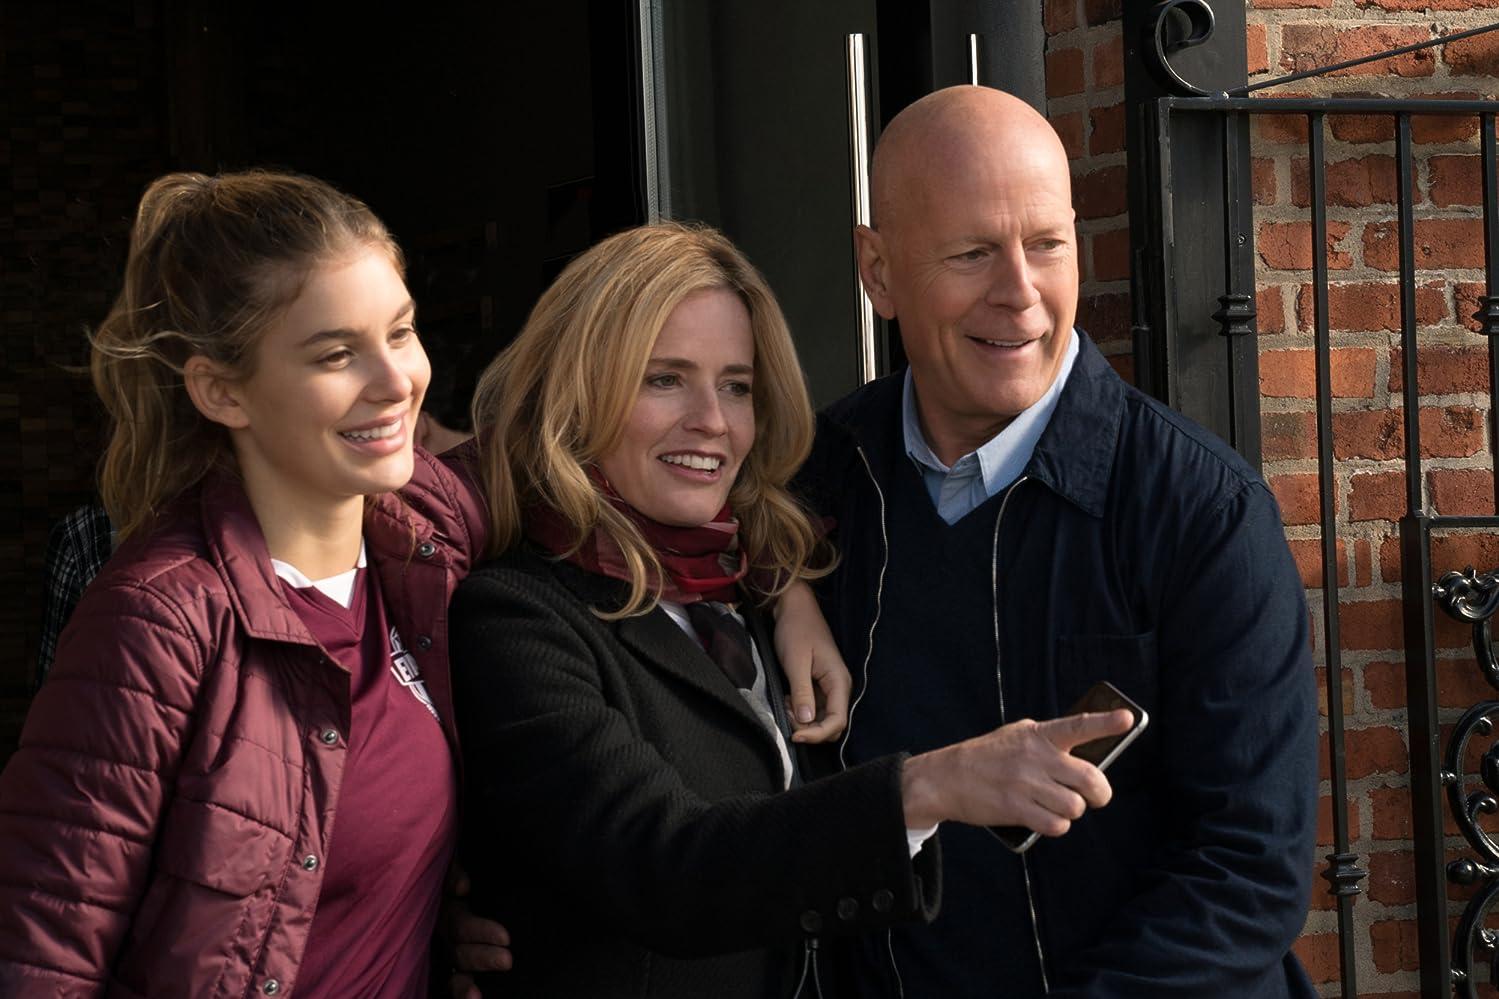 Elisabeth Shue, Bruce Willis, and Camila Morrone in Death Wish (2018)